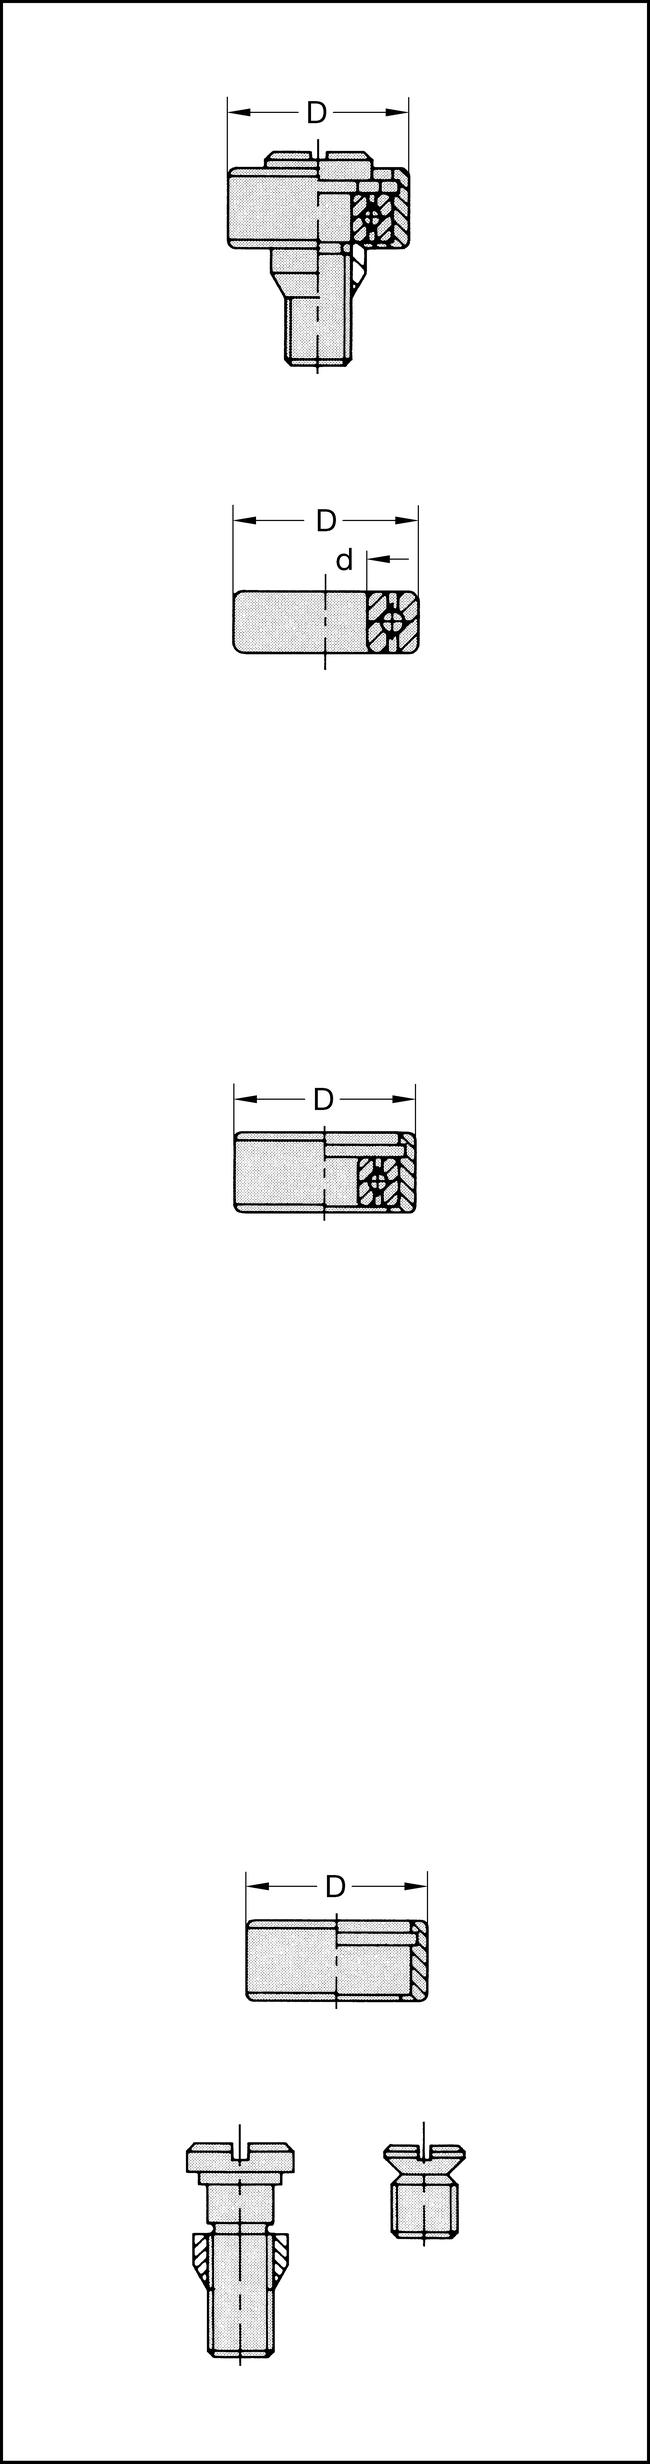 Kugellager 12,7x5mm d=4,76mm